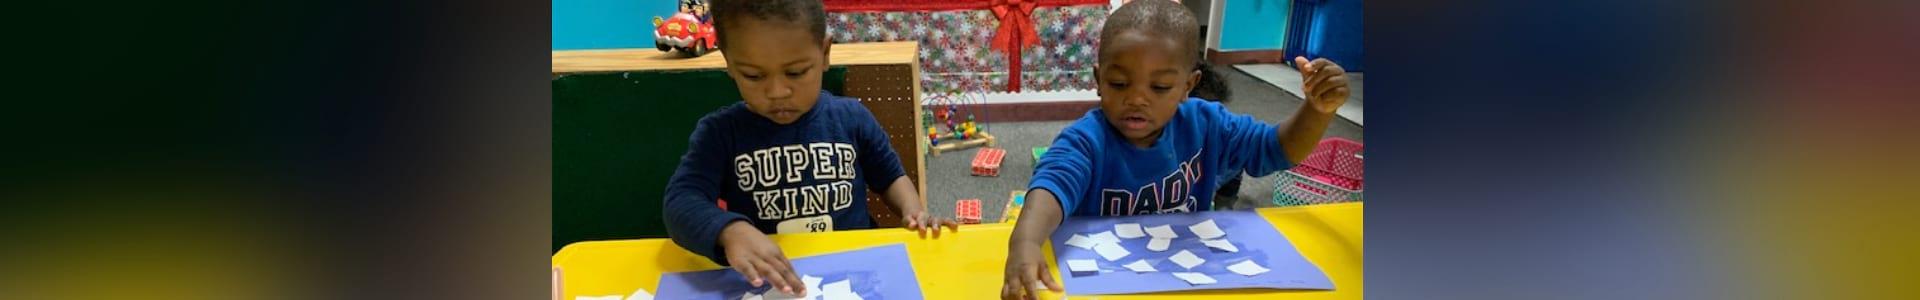 kids doing activity